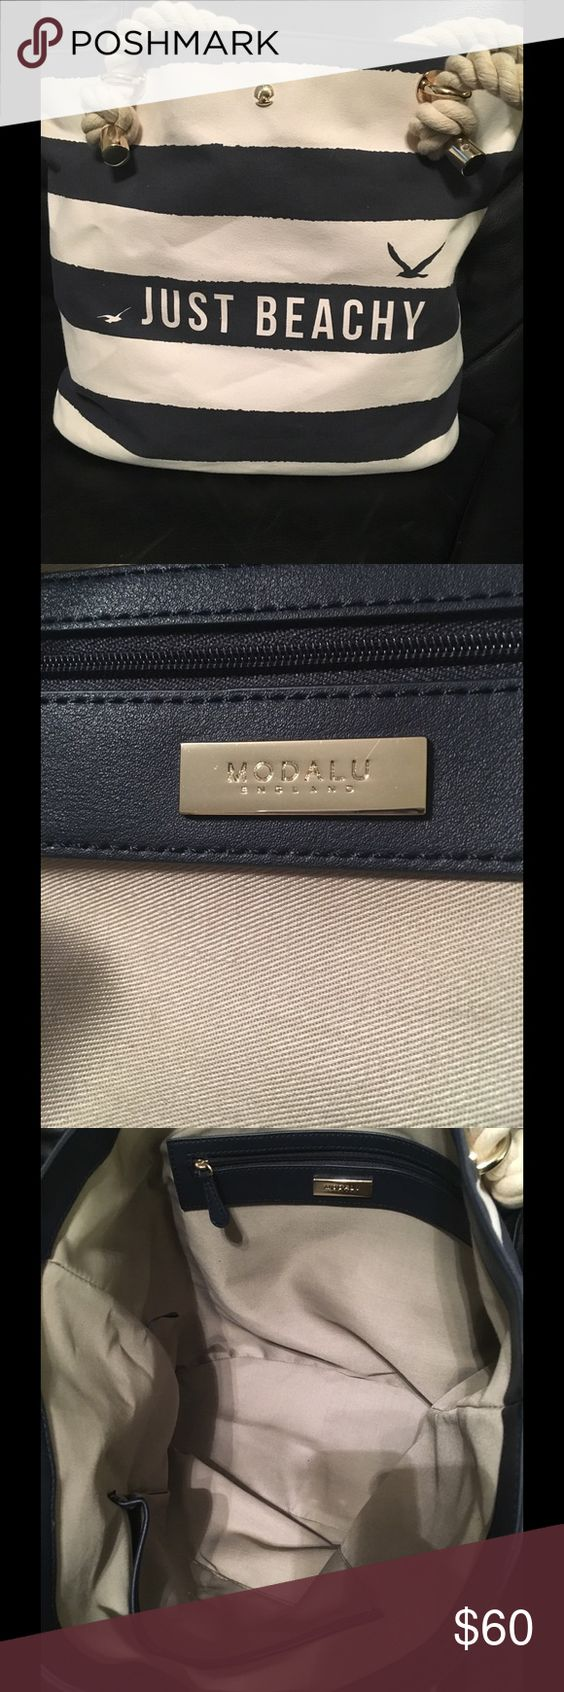 Selling this Modalu Just Beachy Bag on Poshmark! My username is: lsamuels13. #shopmycloset #poshmark #fashion #shopping #style #forsale #Modalu #Handbags